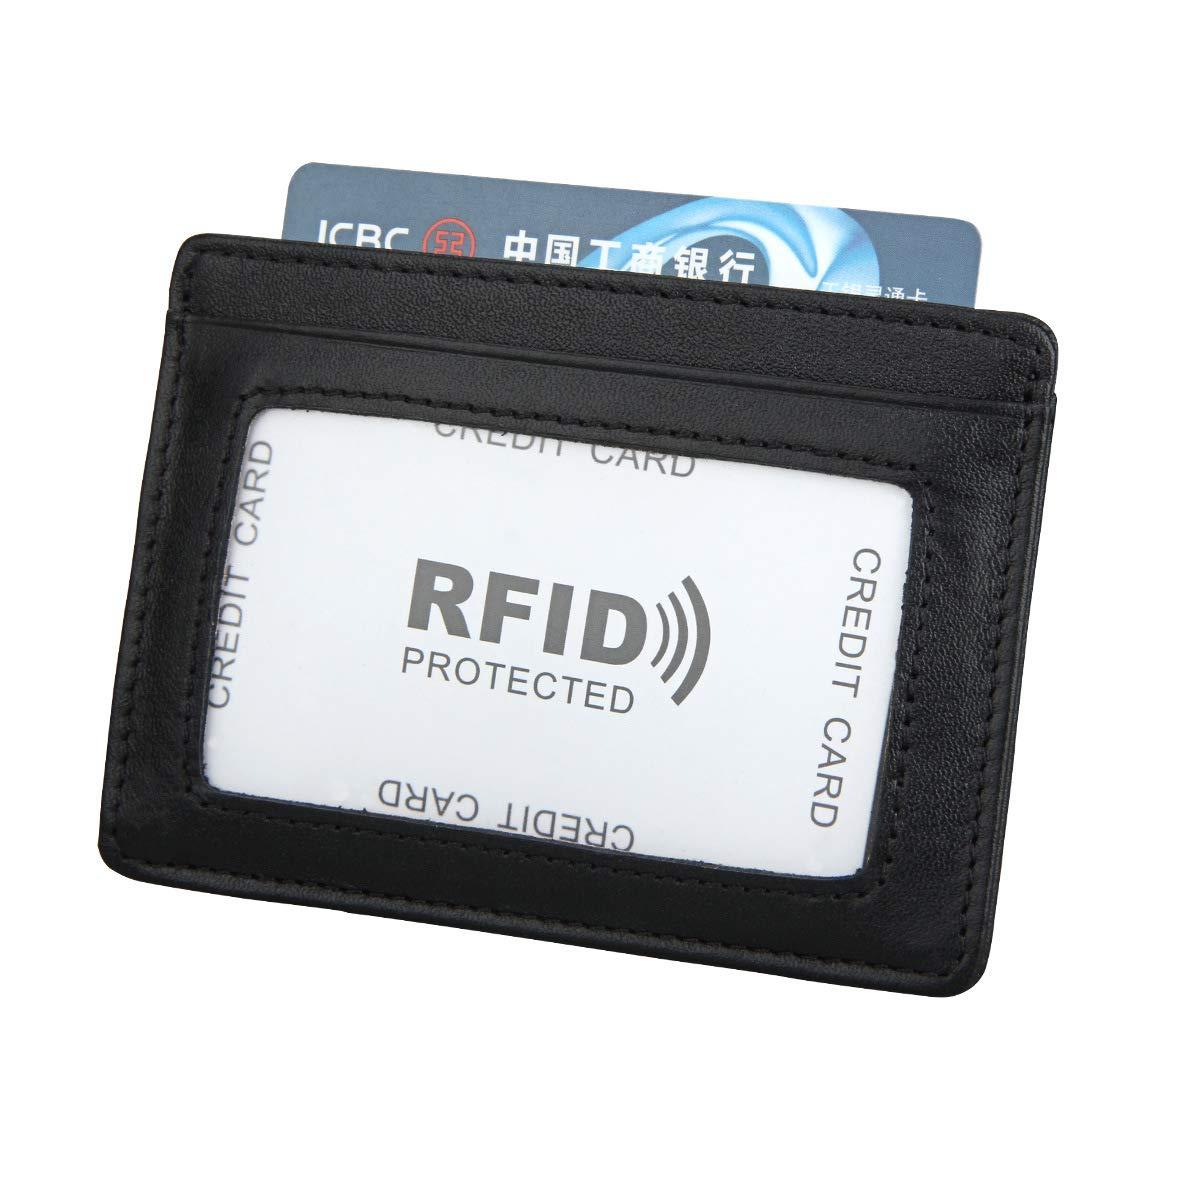 7cd550b814fa Baellerry Slim Credit Card Holder Minimalist Secure Thin Wallet RFID ...